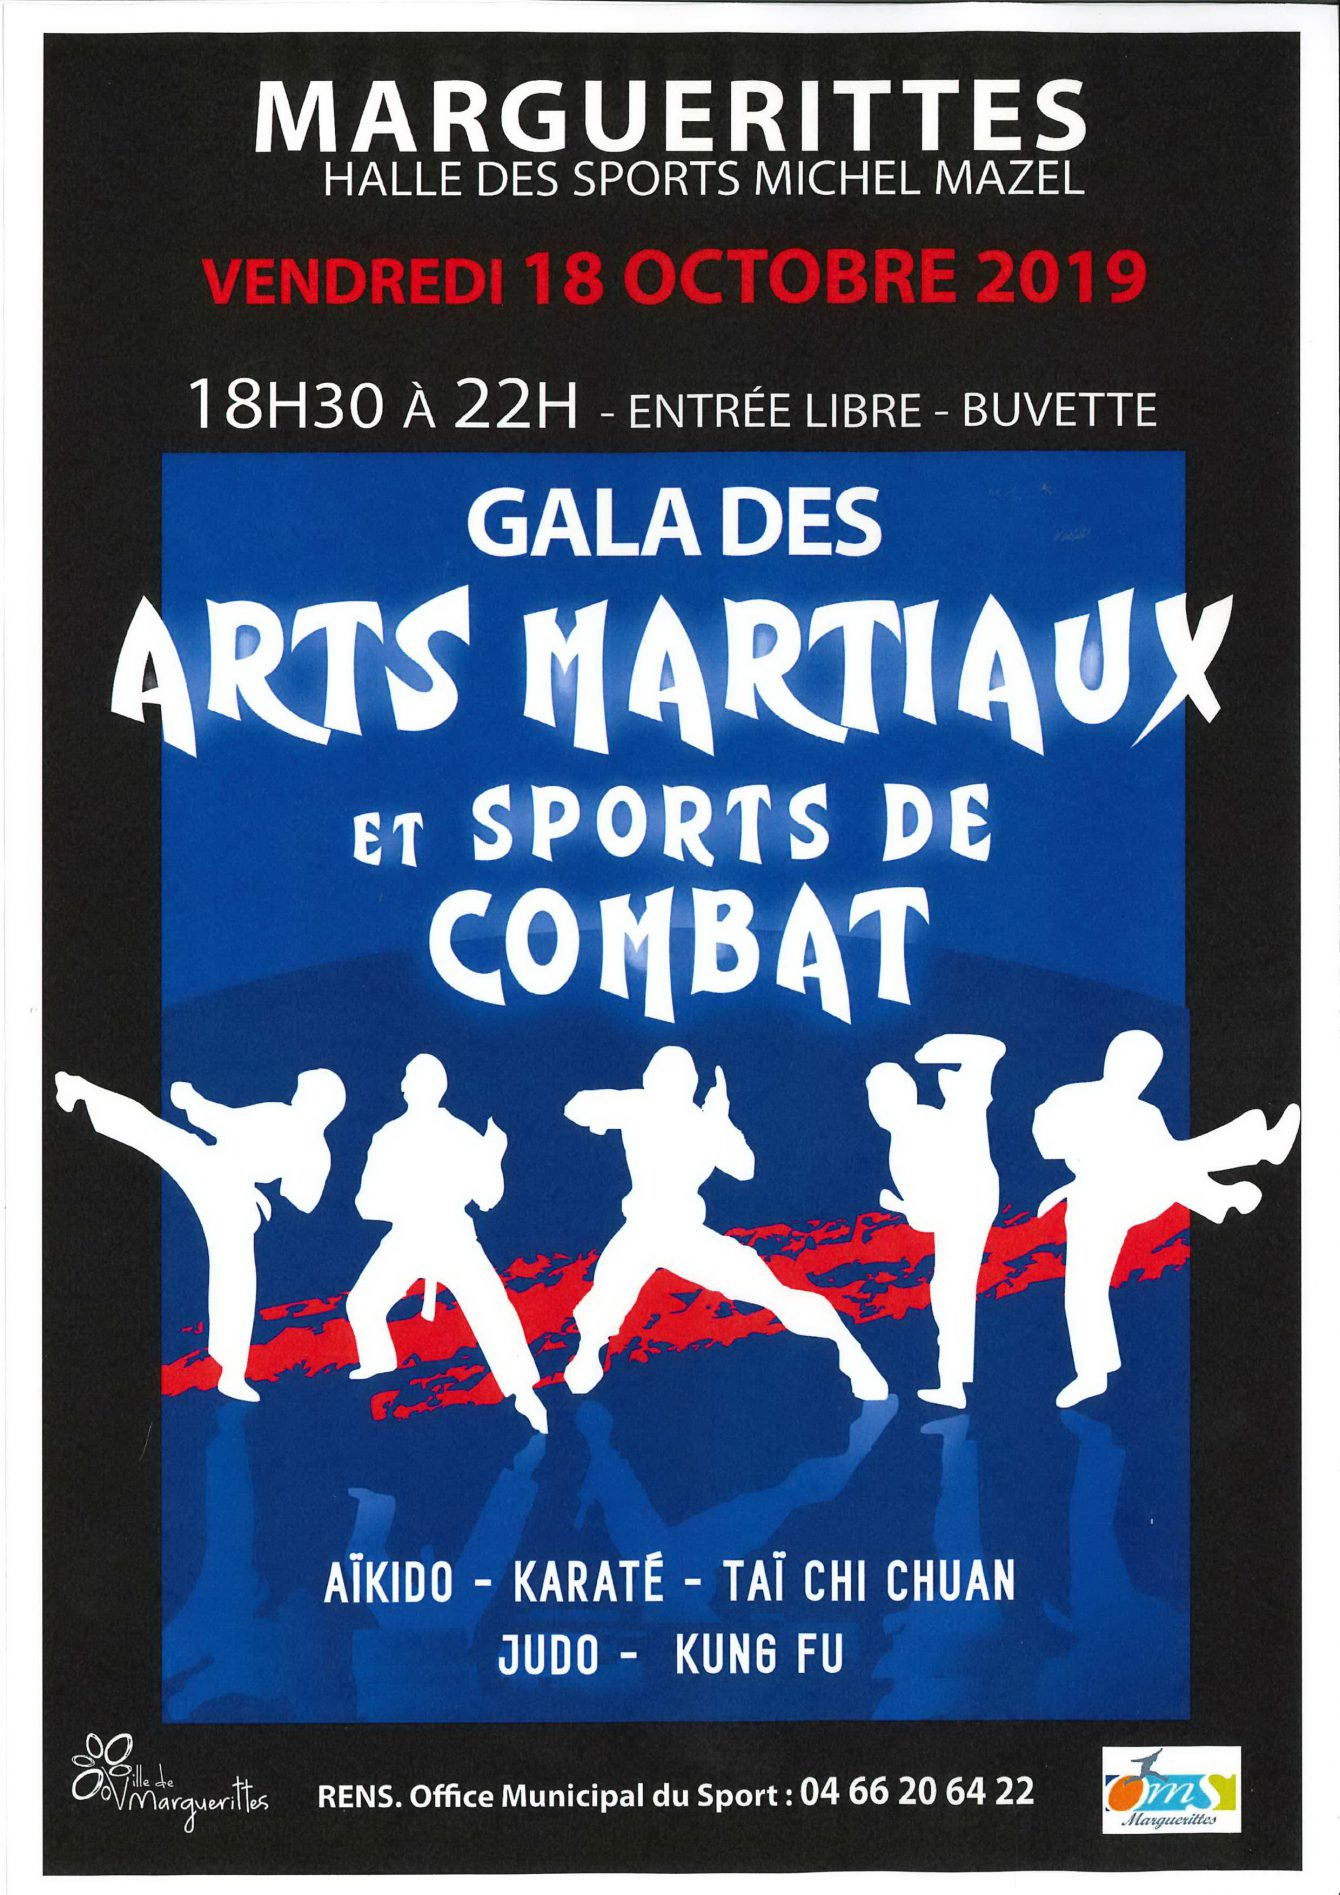 Gala des Arts Martiaux